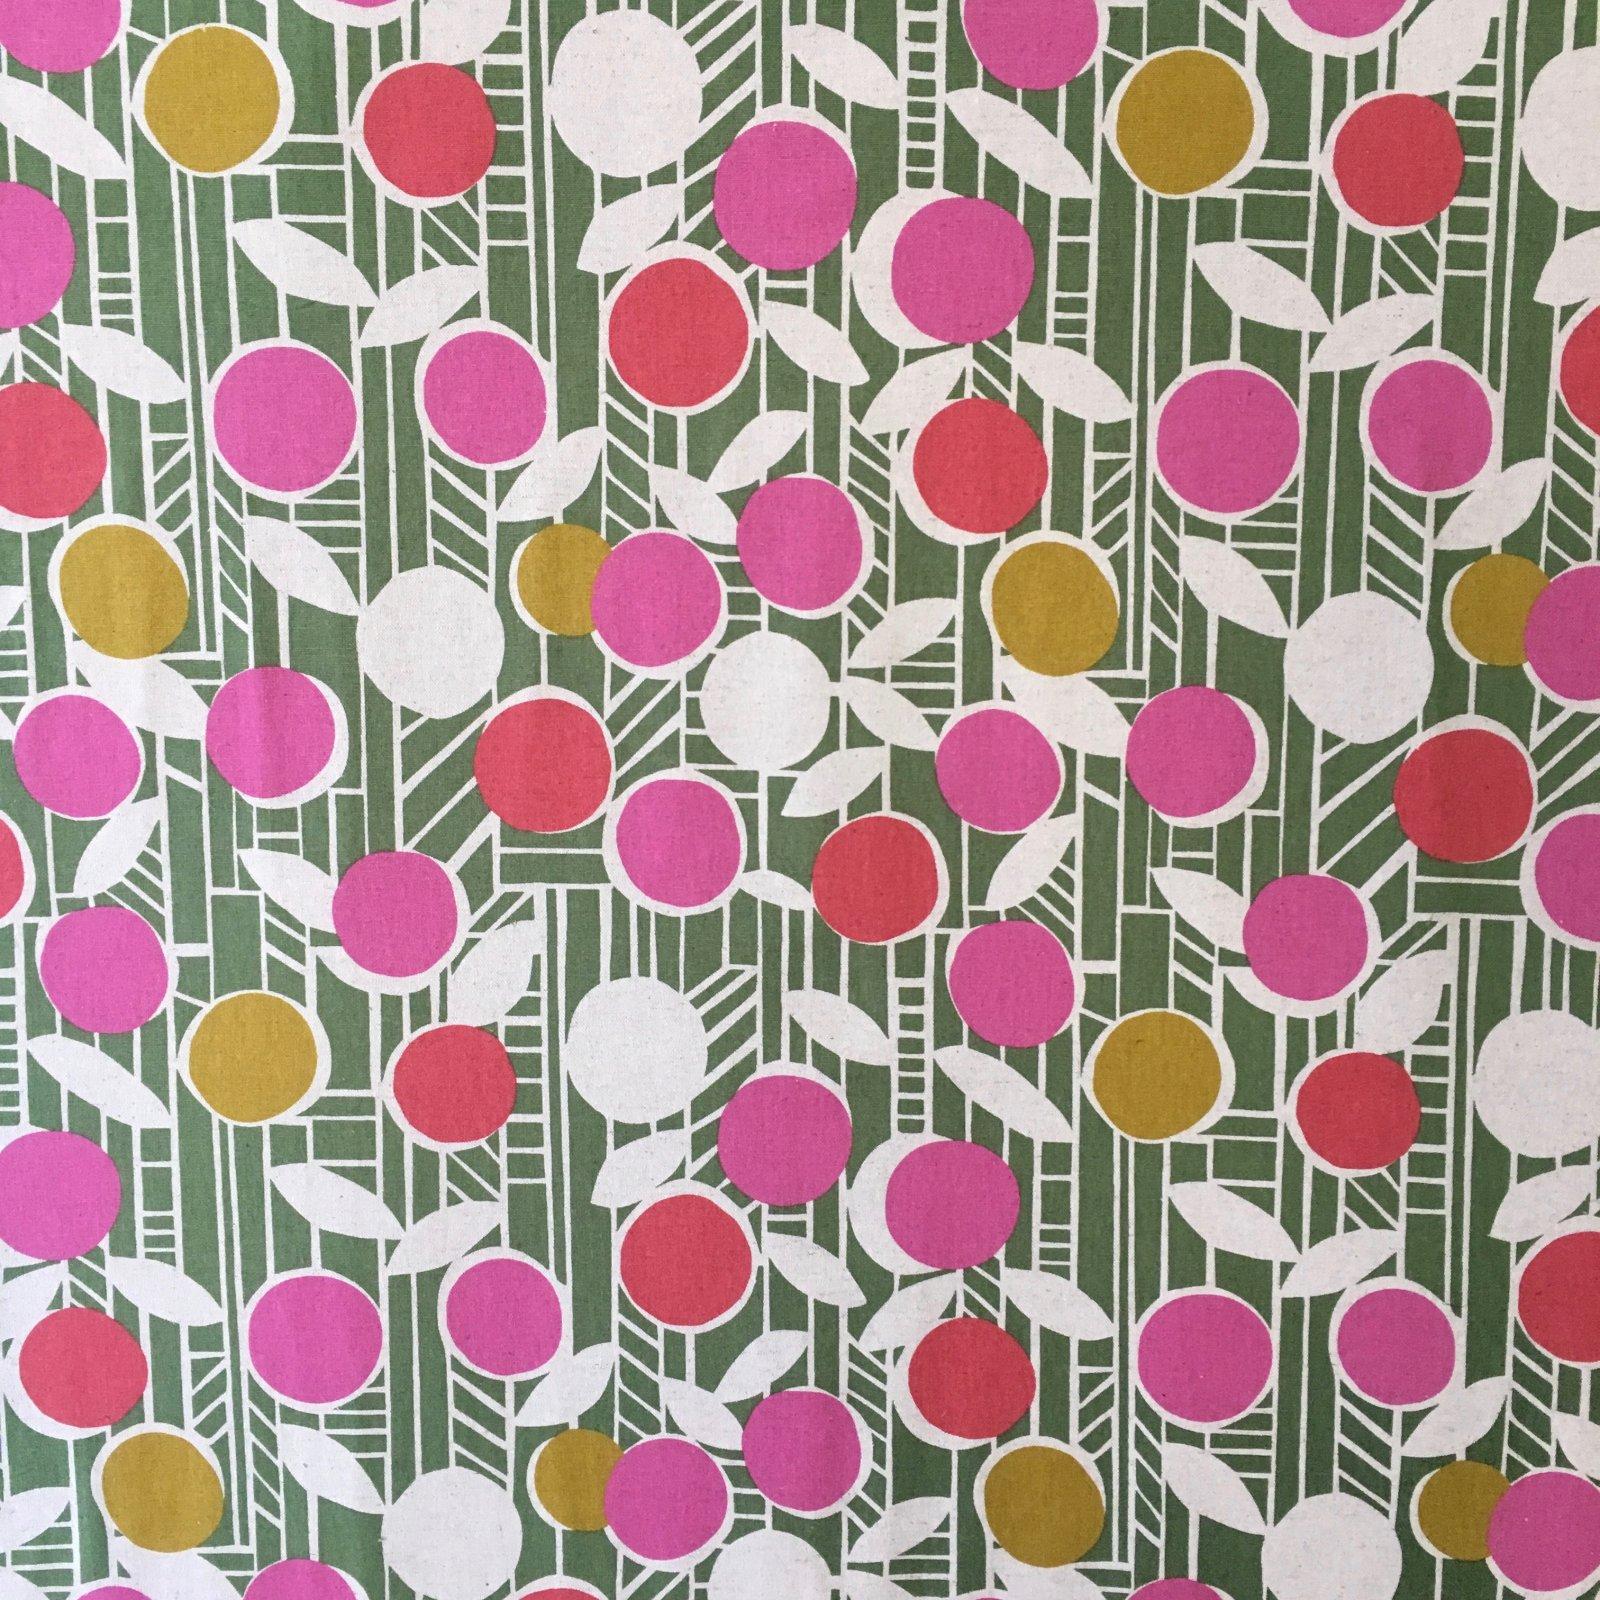 Ellen Baker Paper - Flowers (Green)